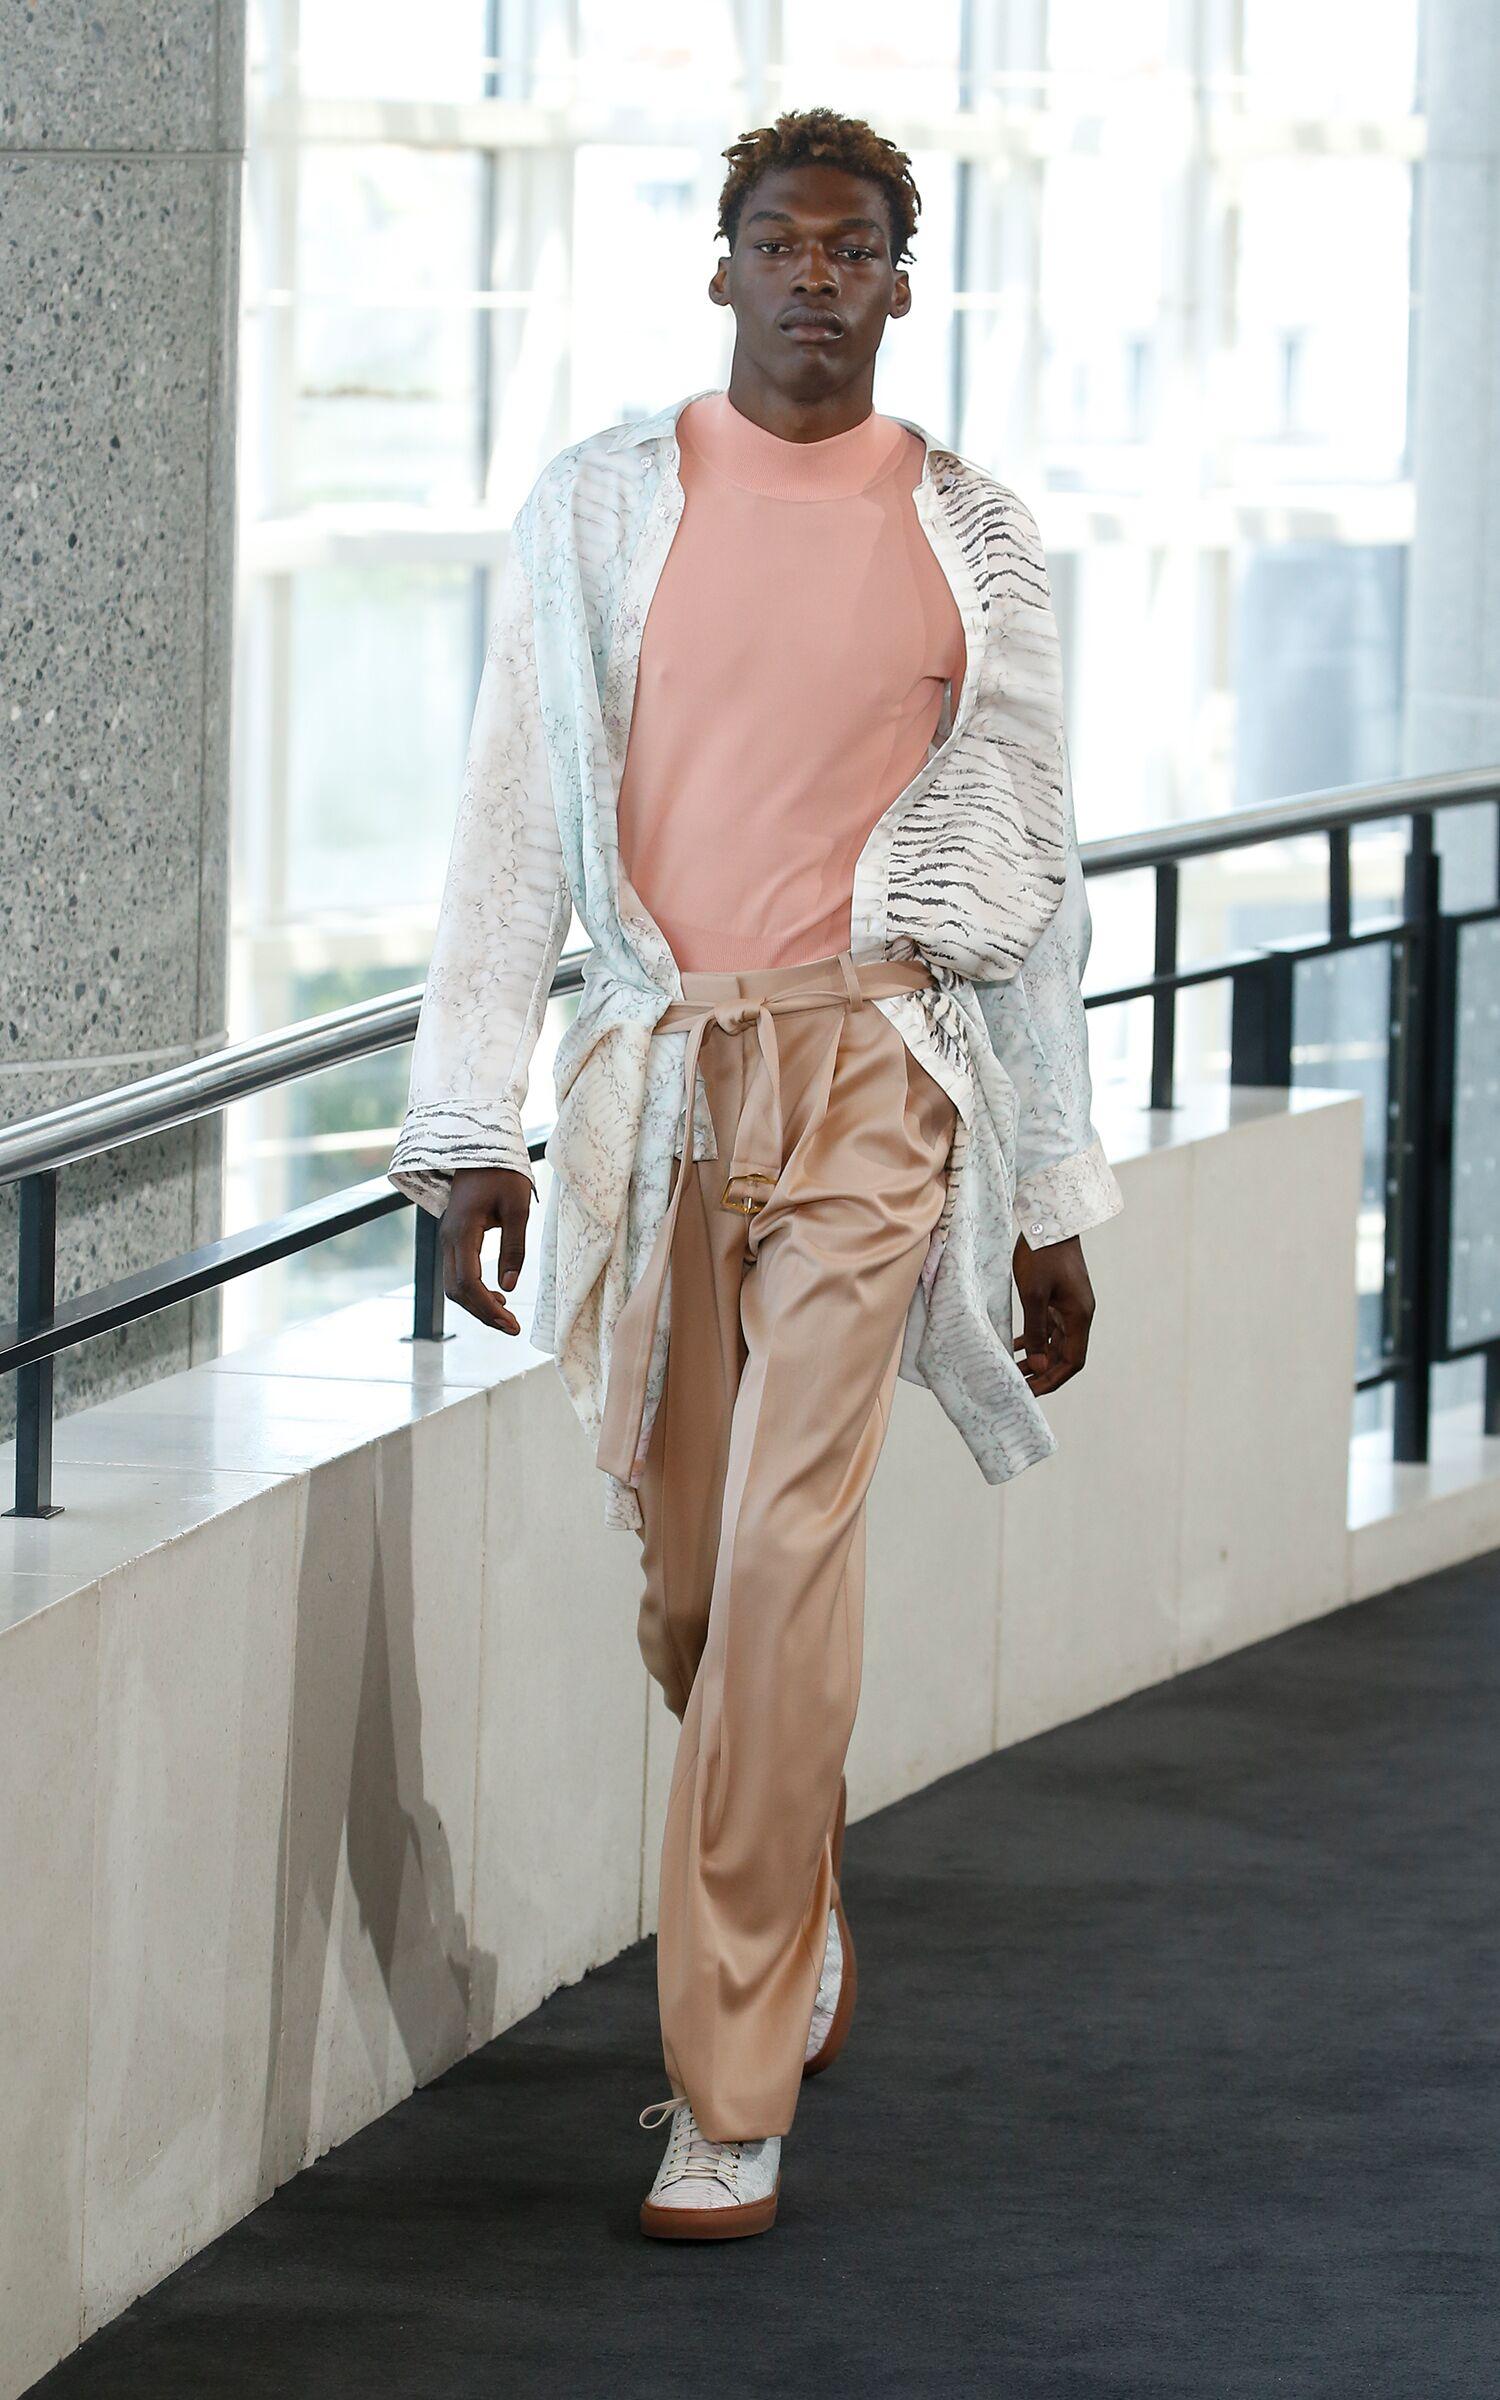 Fashion Model Sies Marjan Catwalk